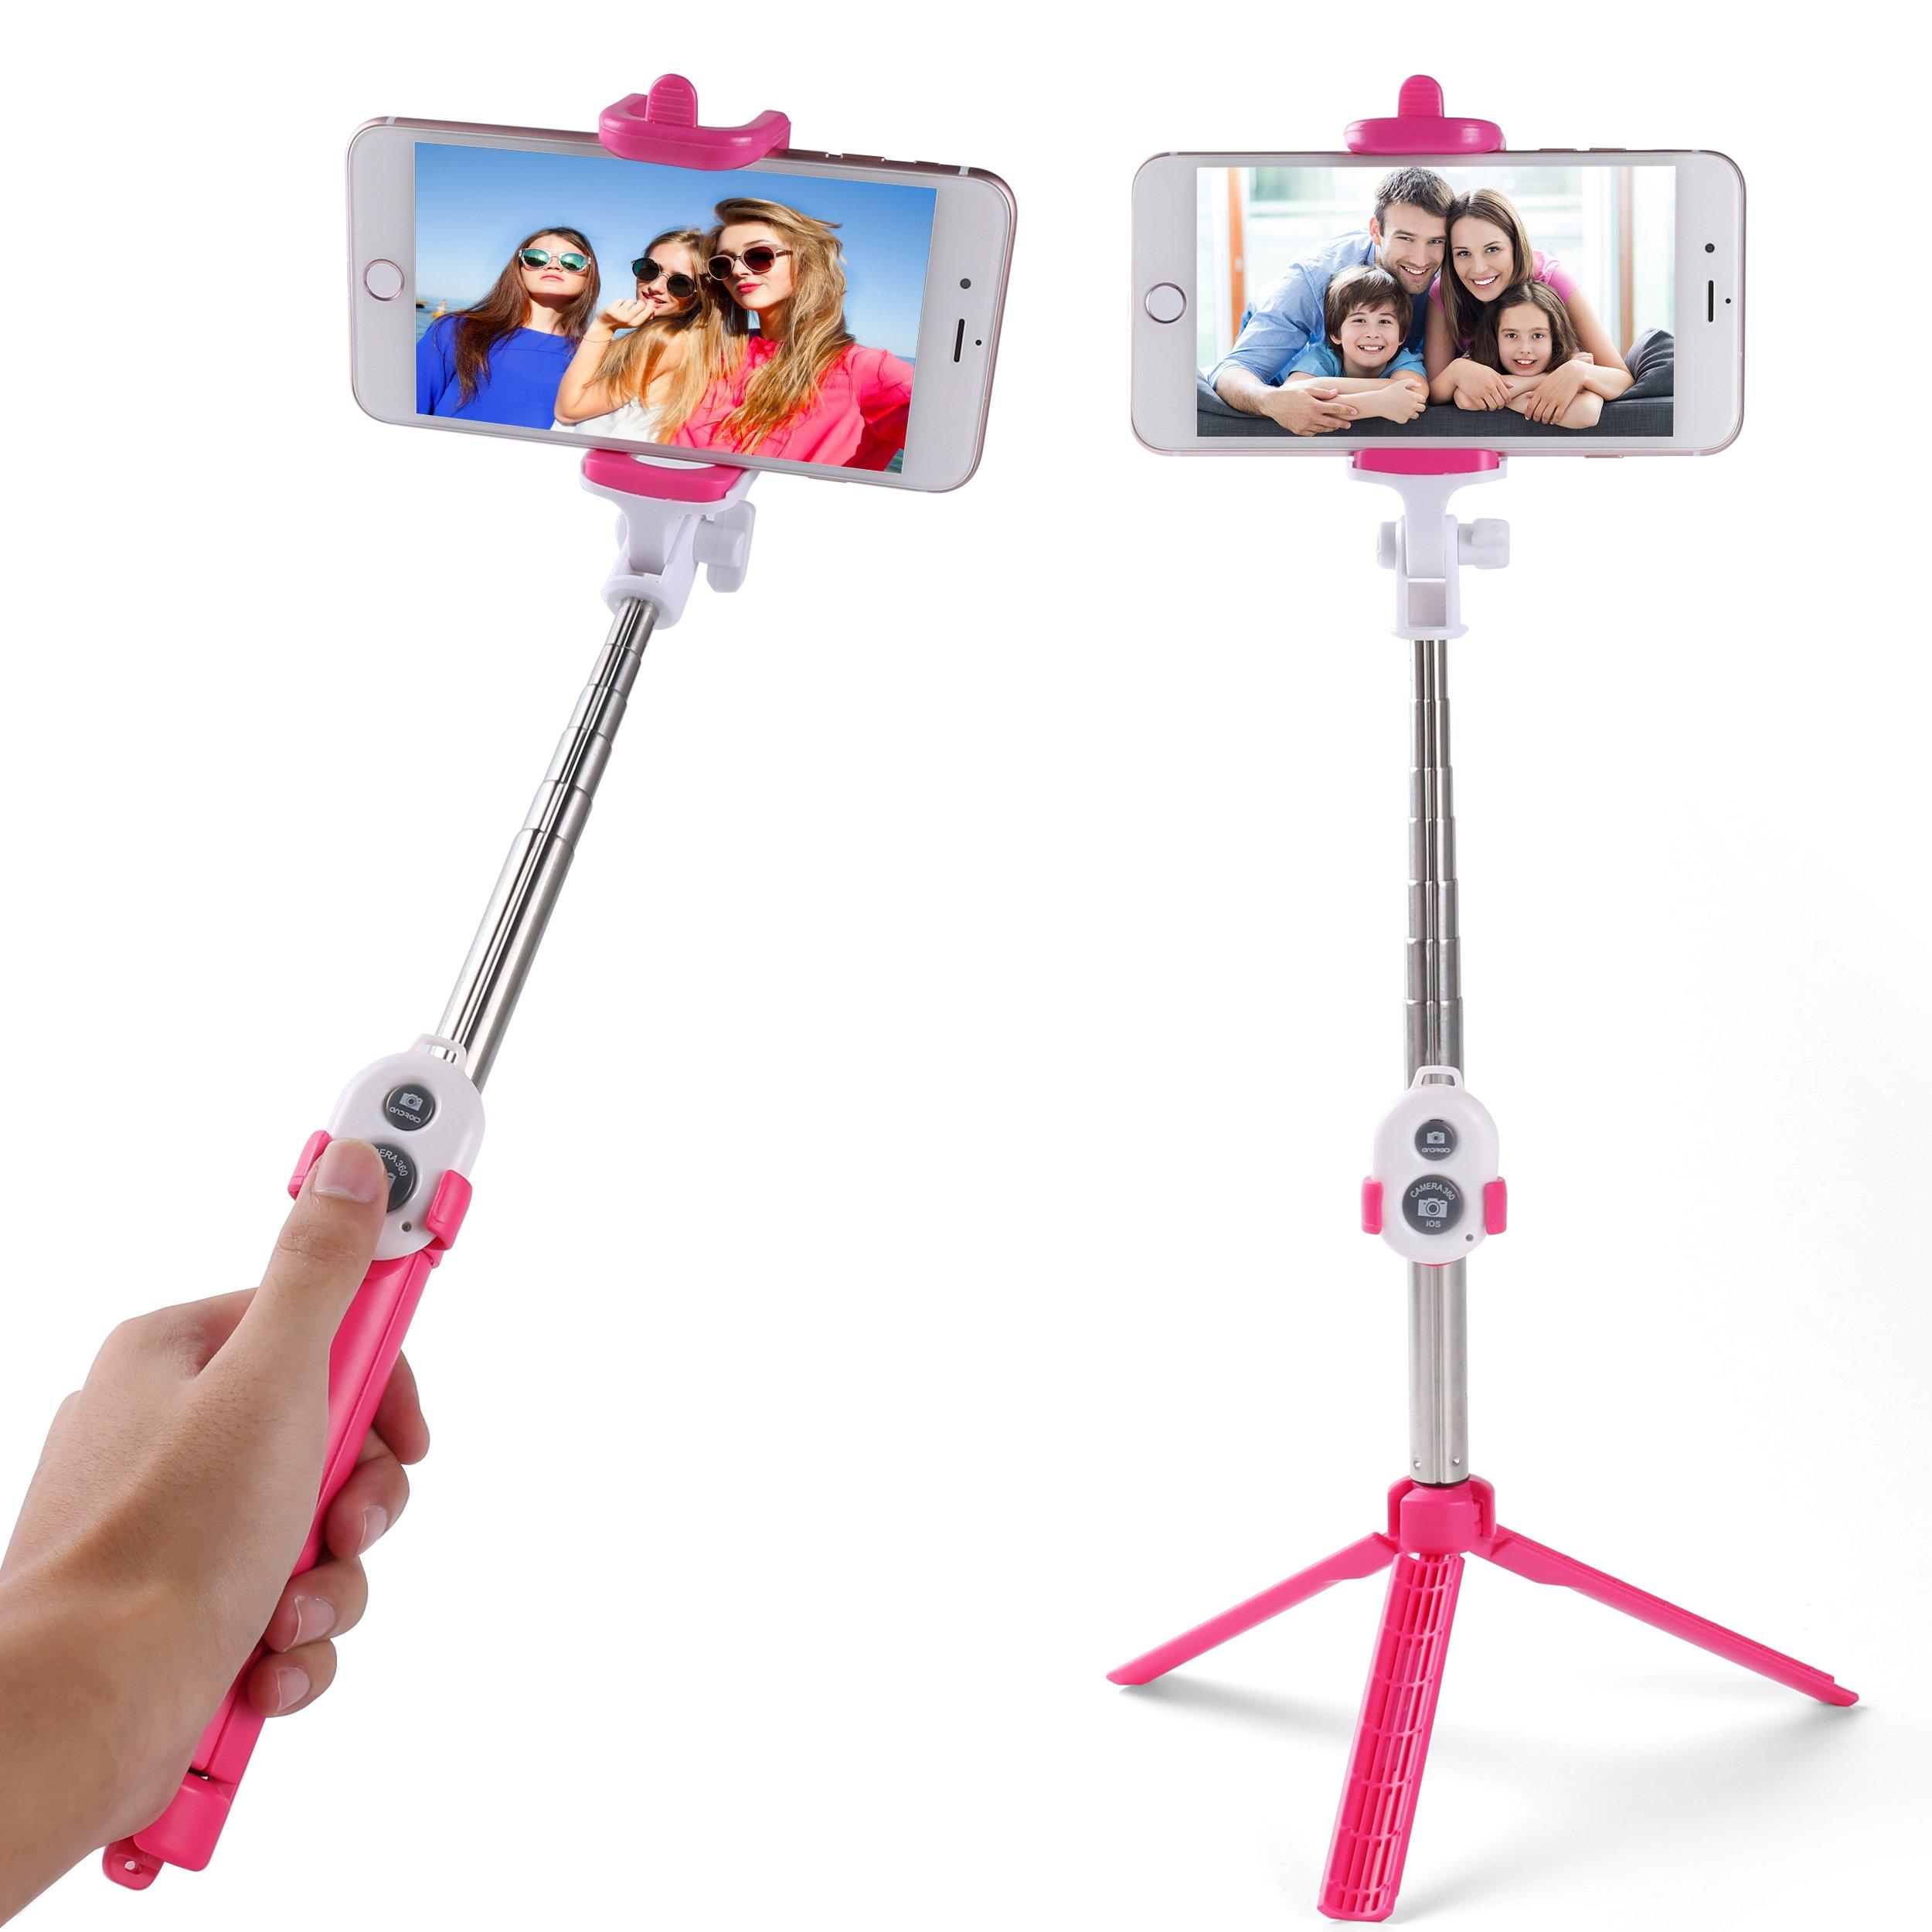 For Google Pixel/Pixel XL Selfie Stick, Extendable Tripod with Built-In Stand Kickstand + Bluetooth Remote Shutter Button (Hot Pink)